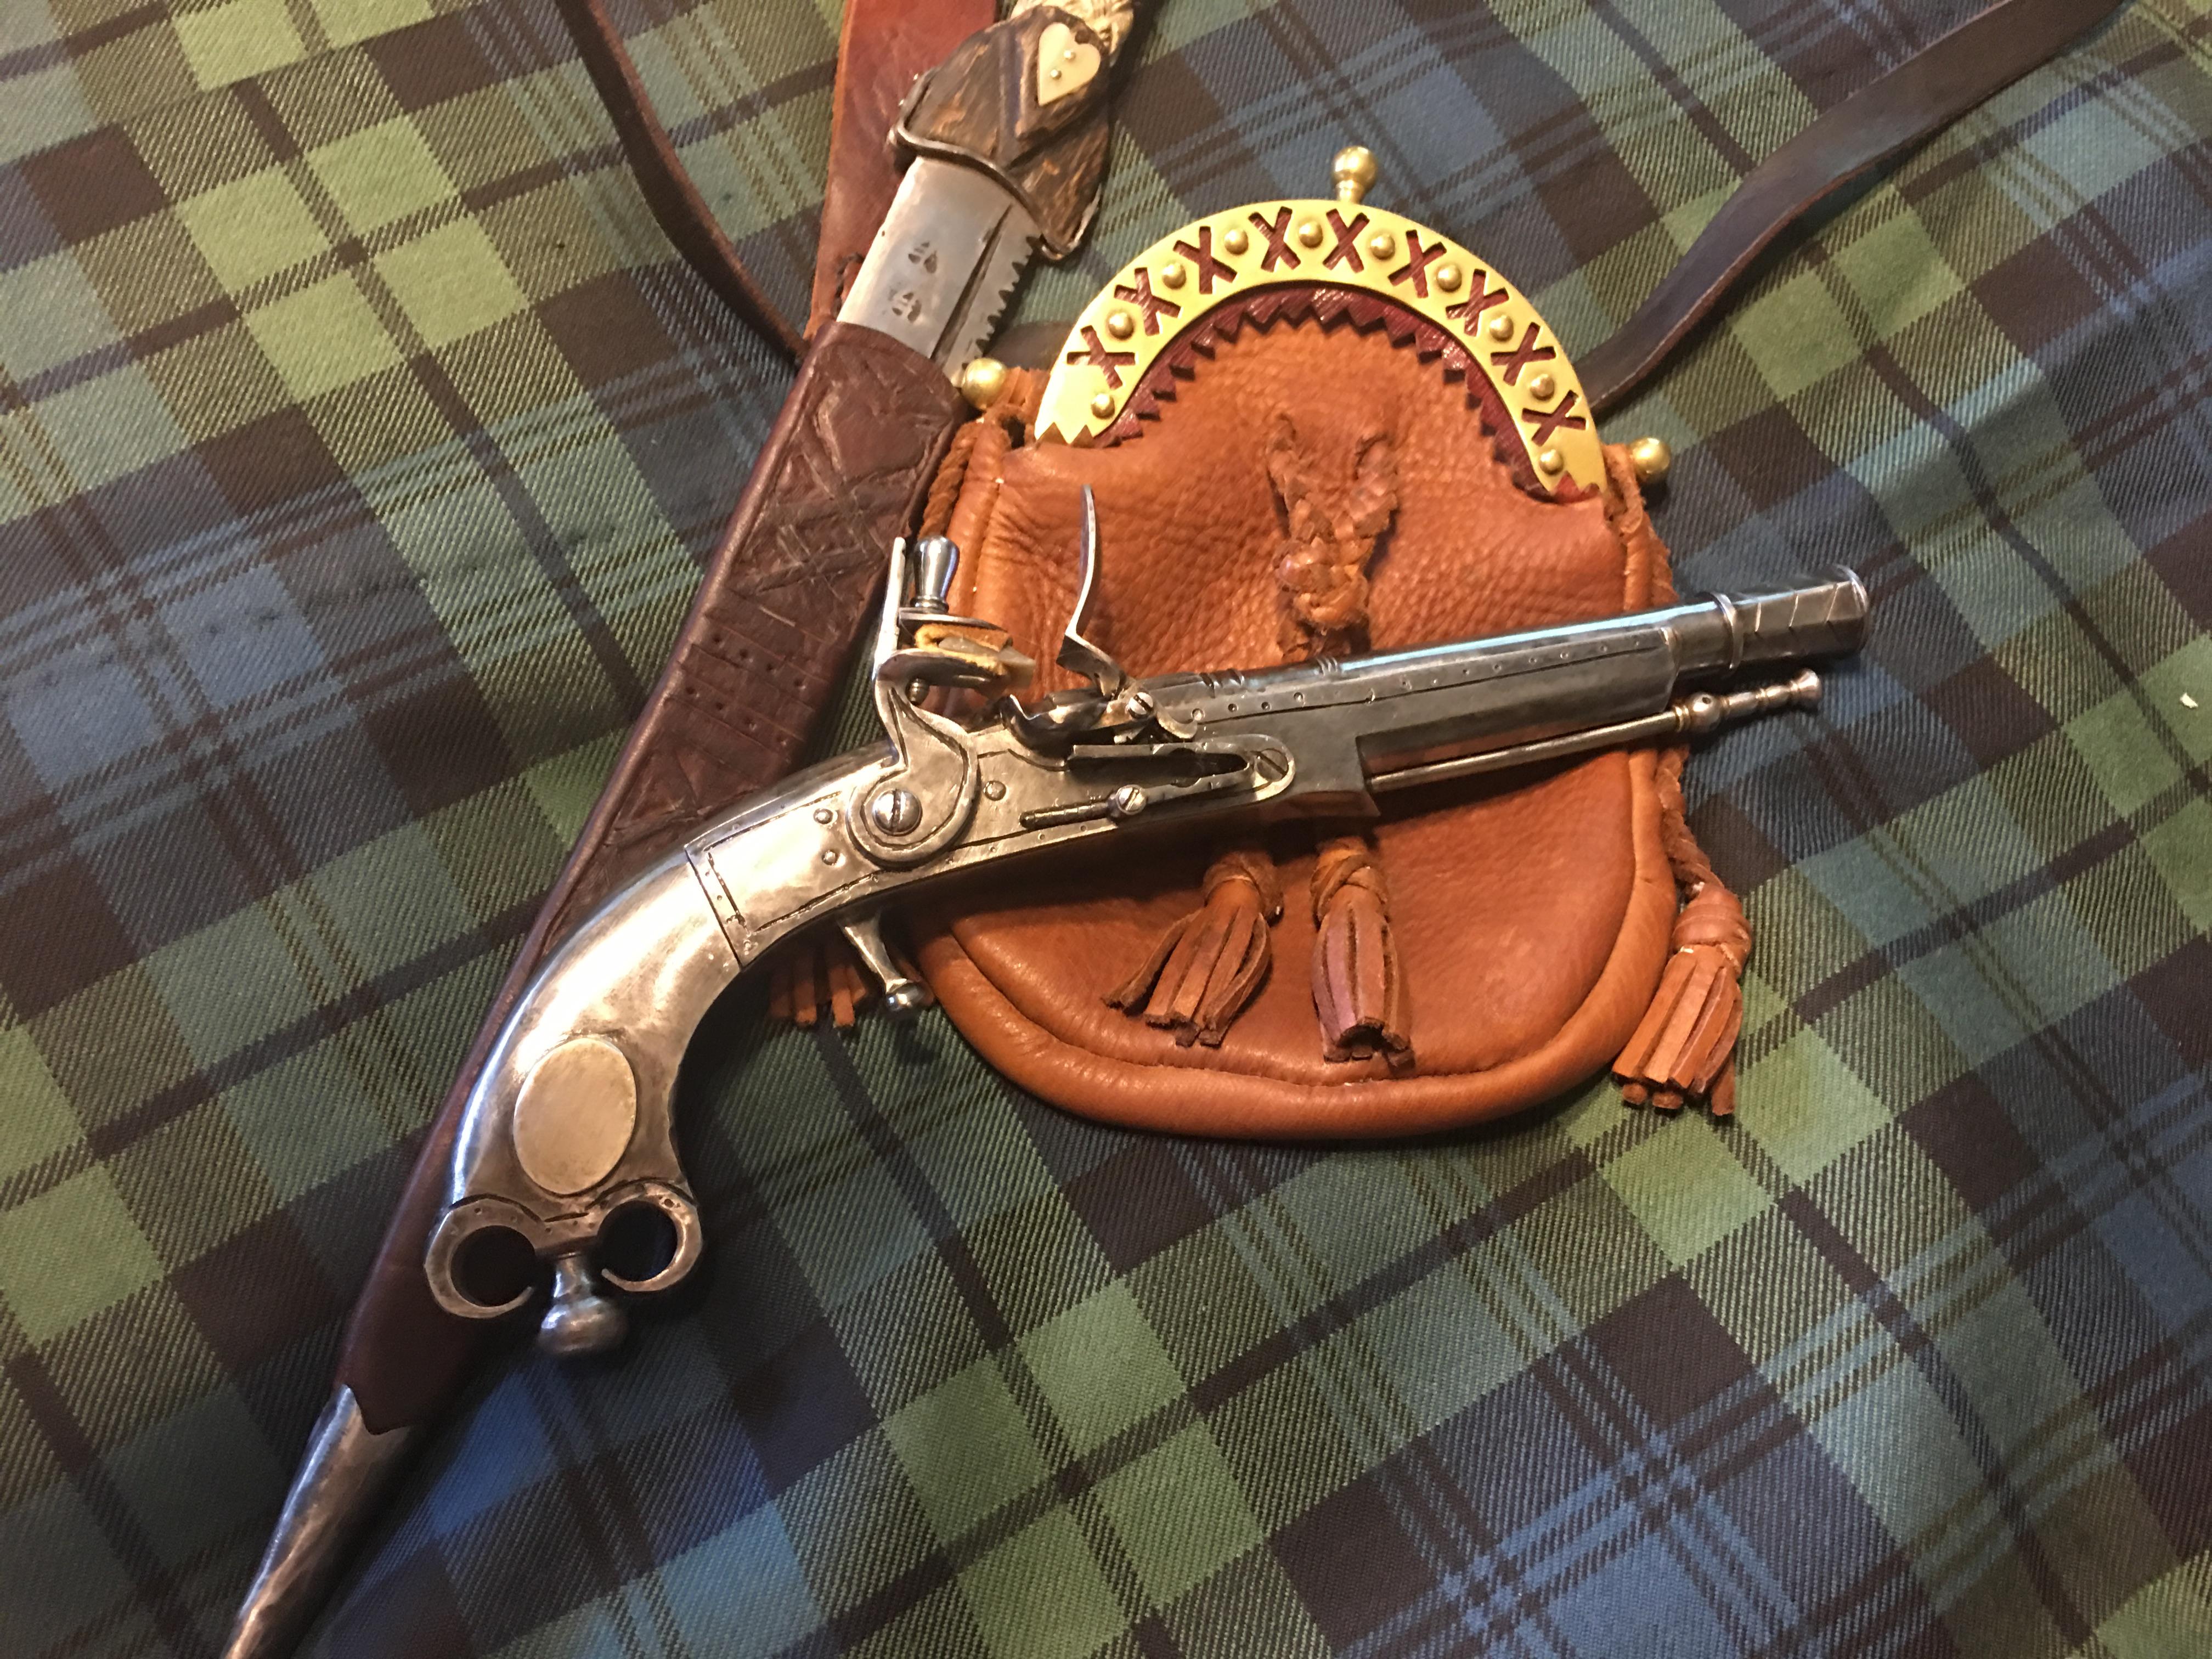 A Highland Pistol